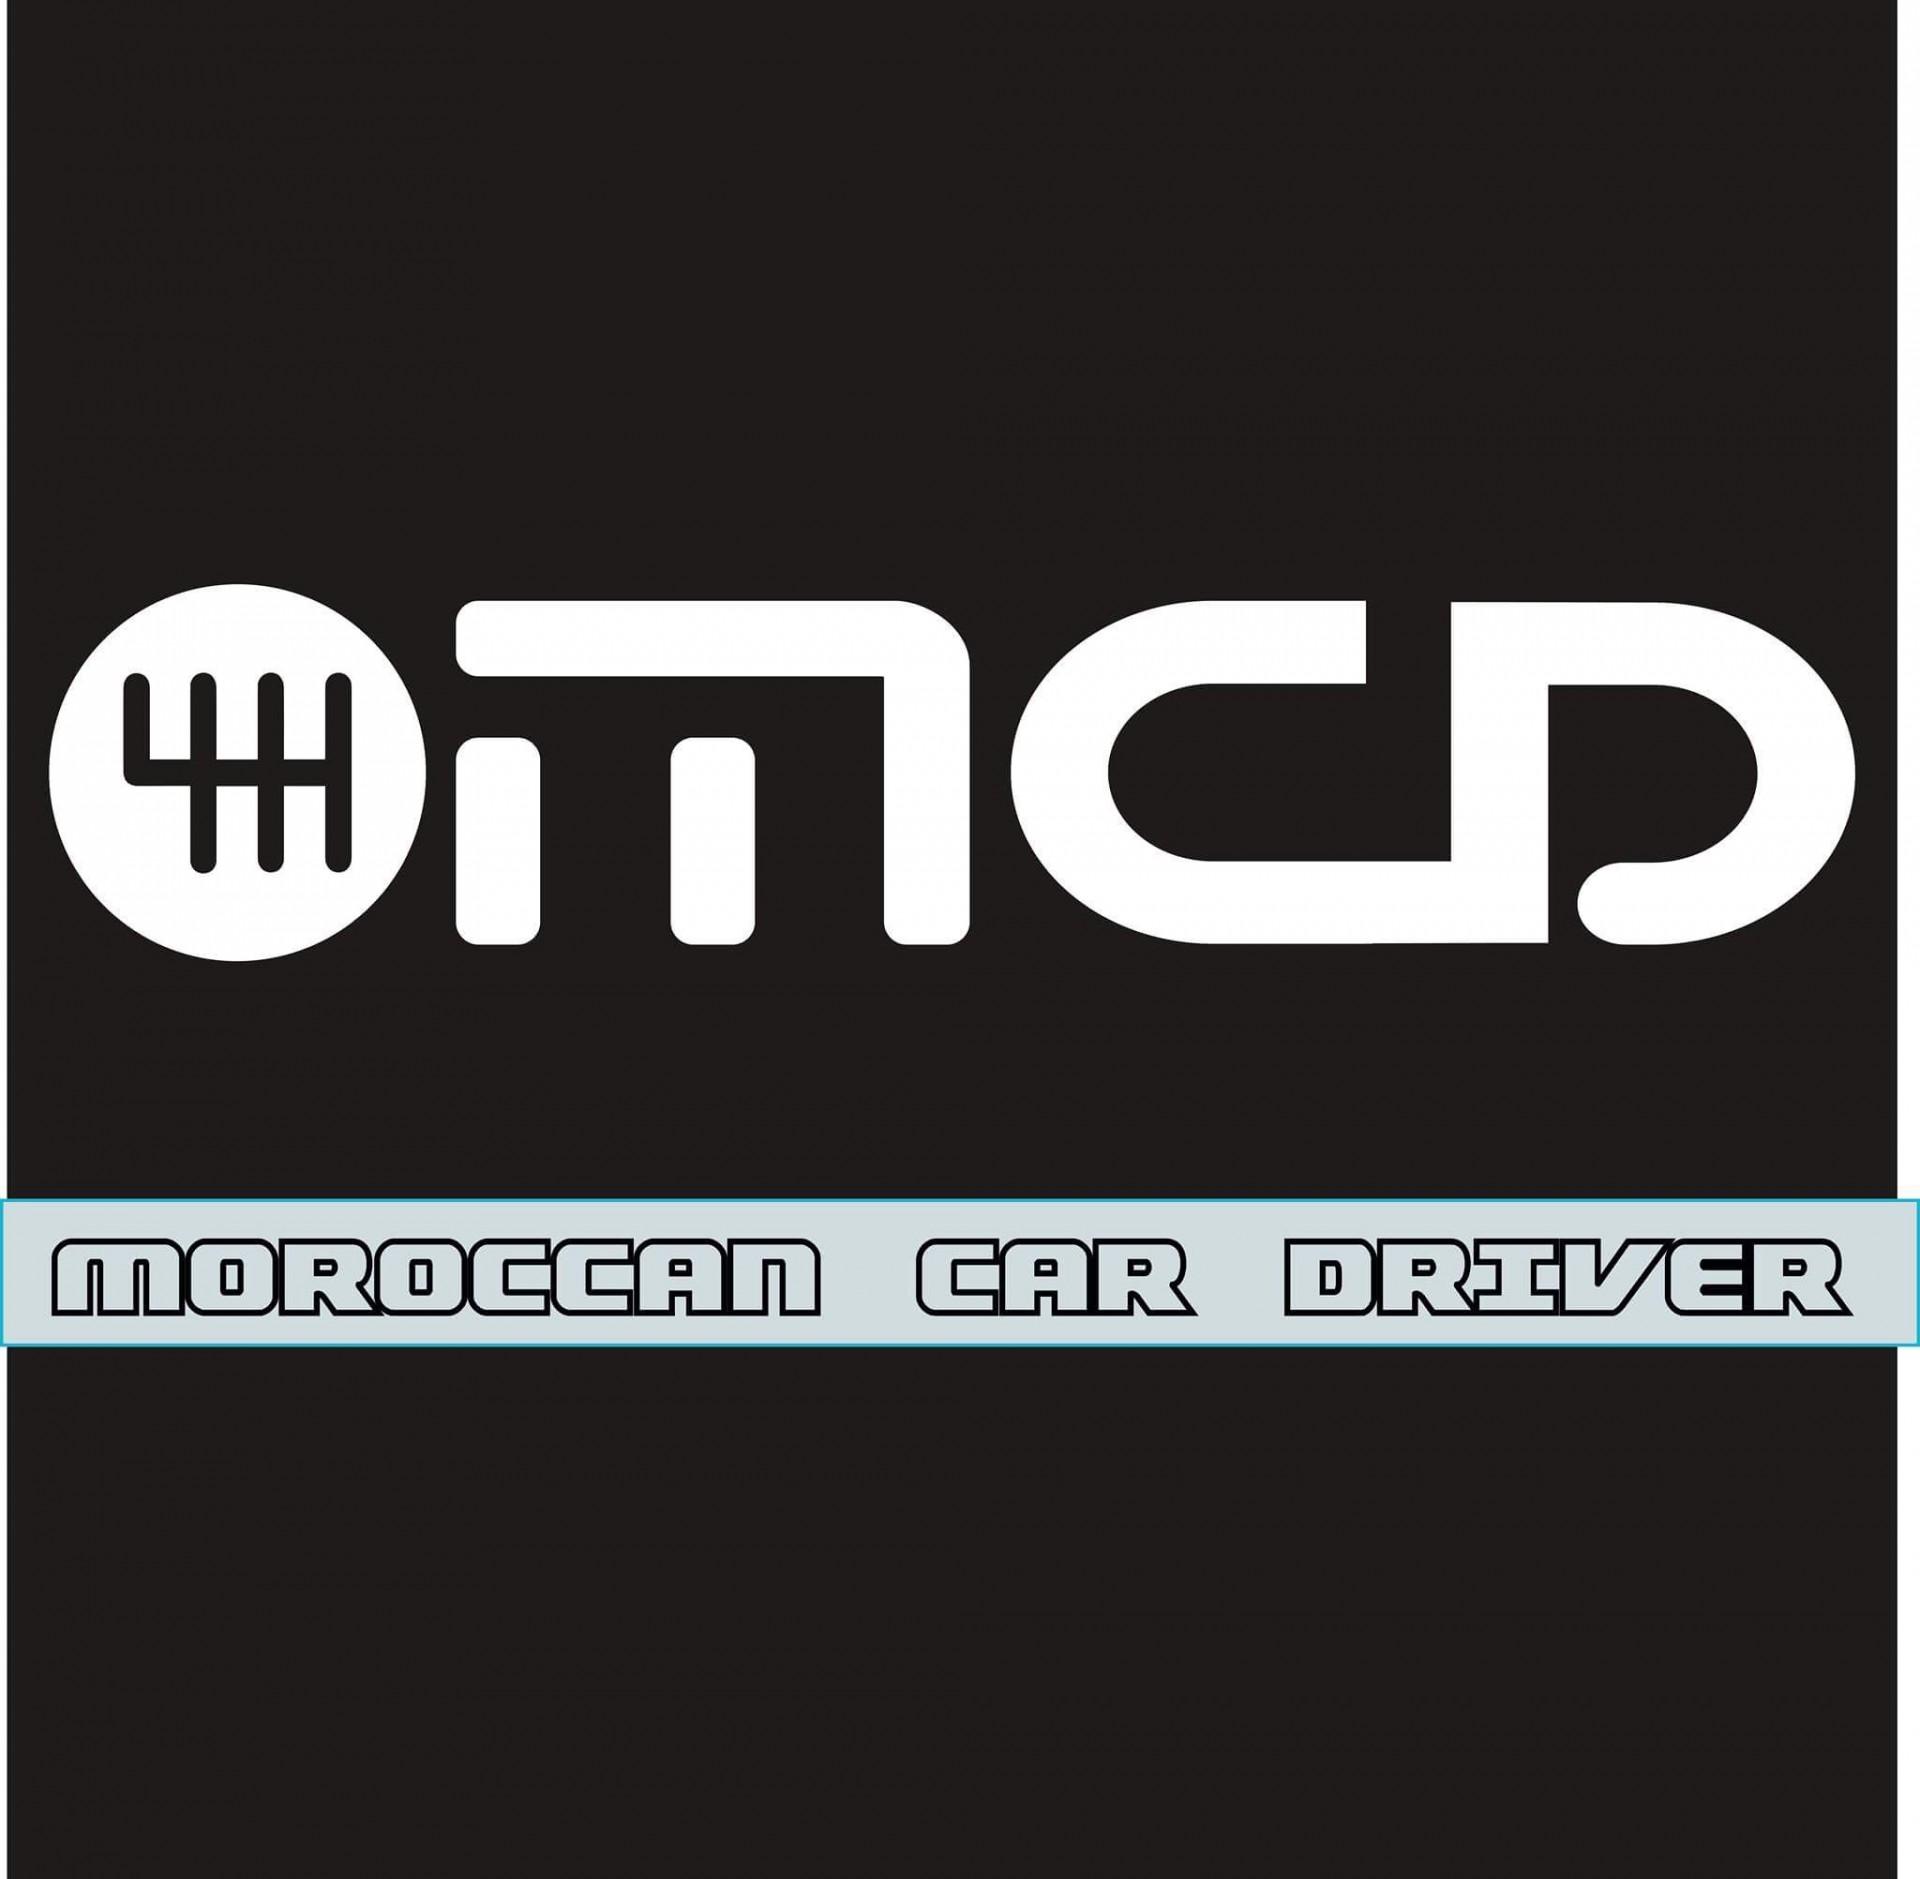 MOROCCAN CAR DRIVER logo